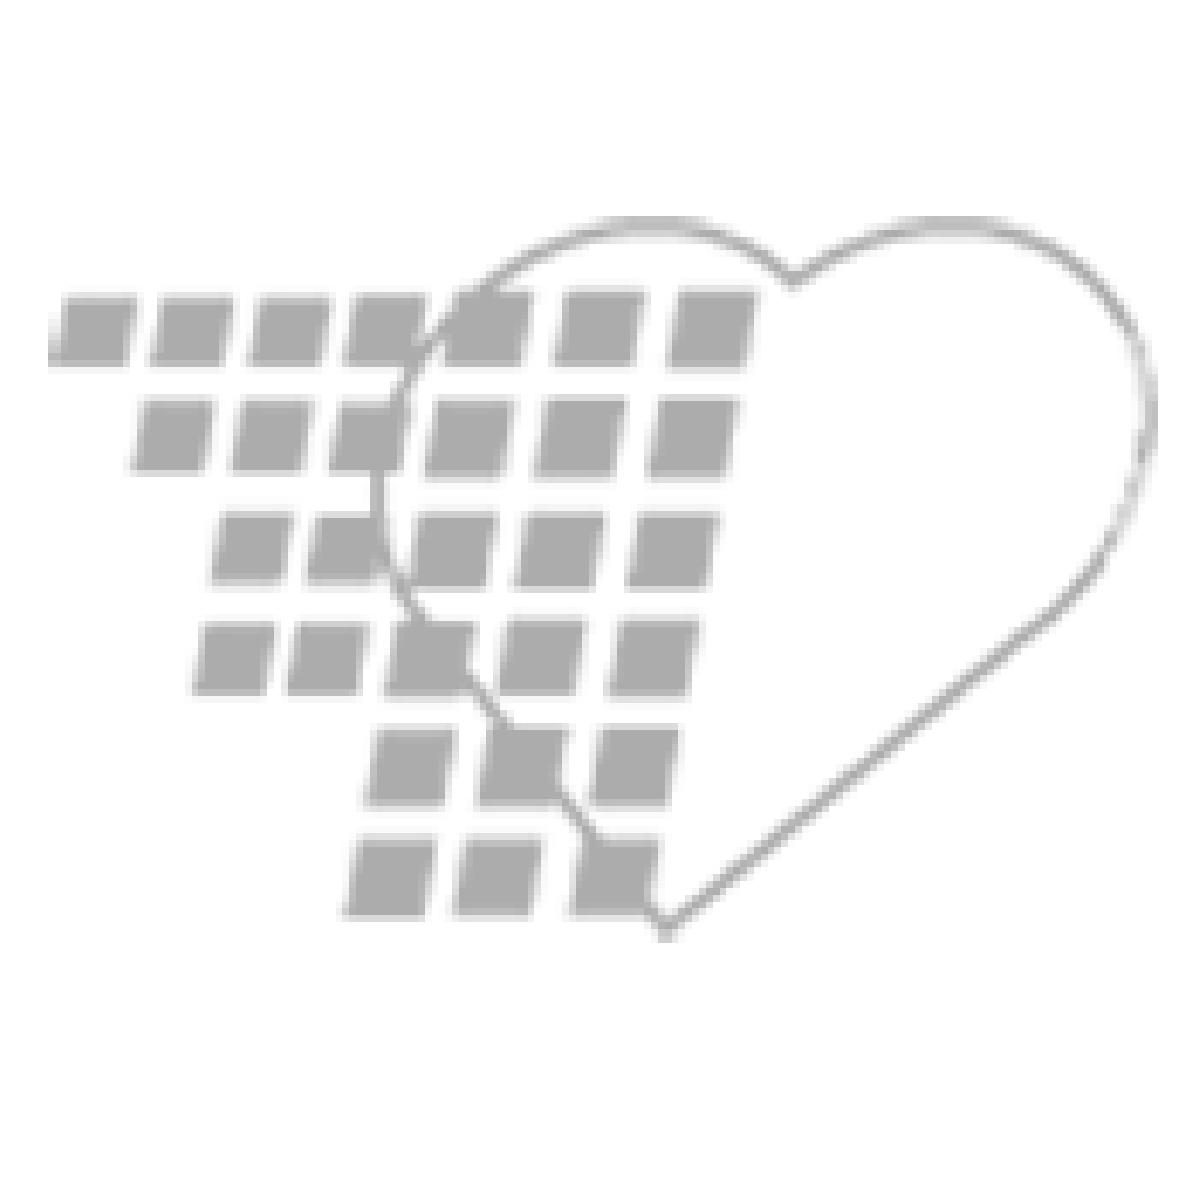 02-43-9301 ECG With Interpretation 3 Channel